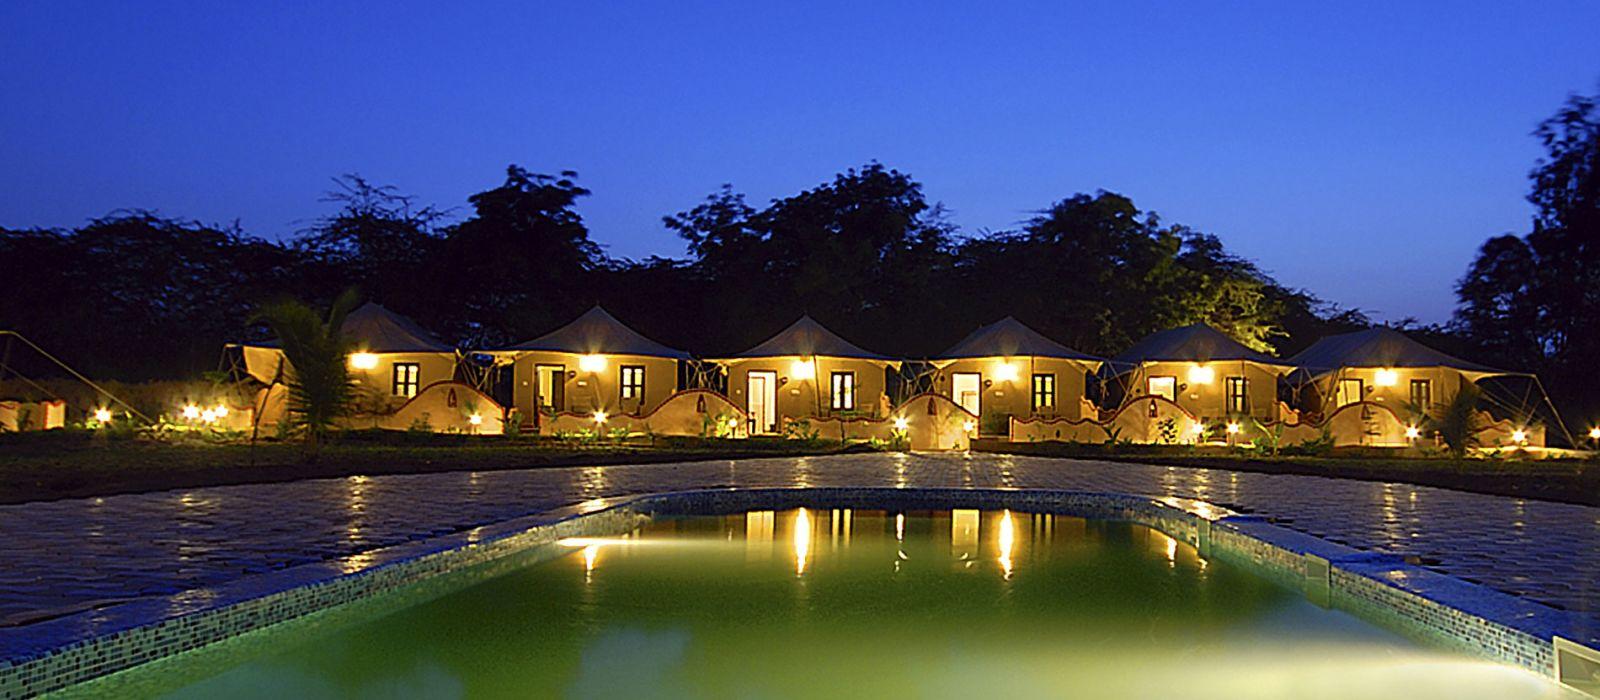 Hotel Infinity Resort (Rann of Kutch) Zentral- & Westindien